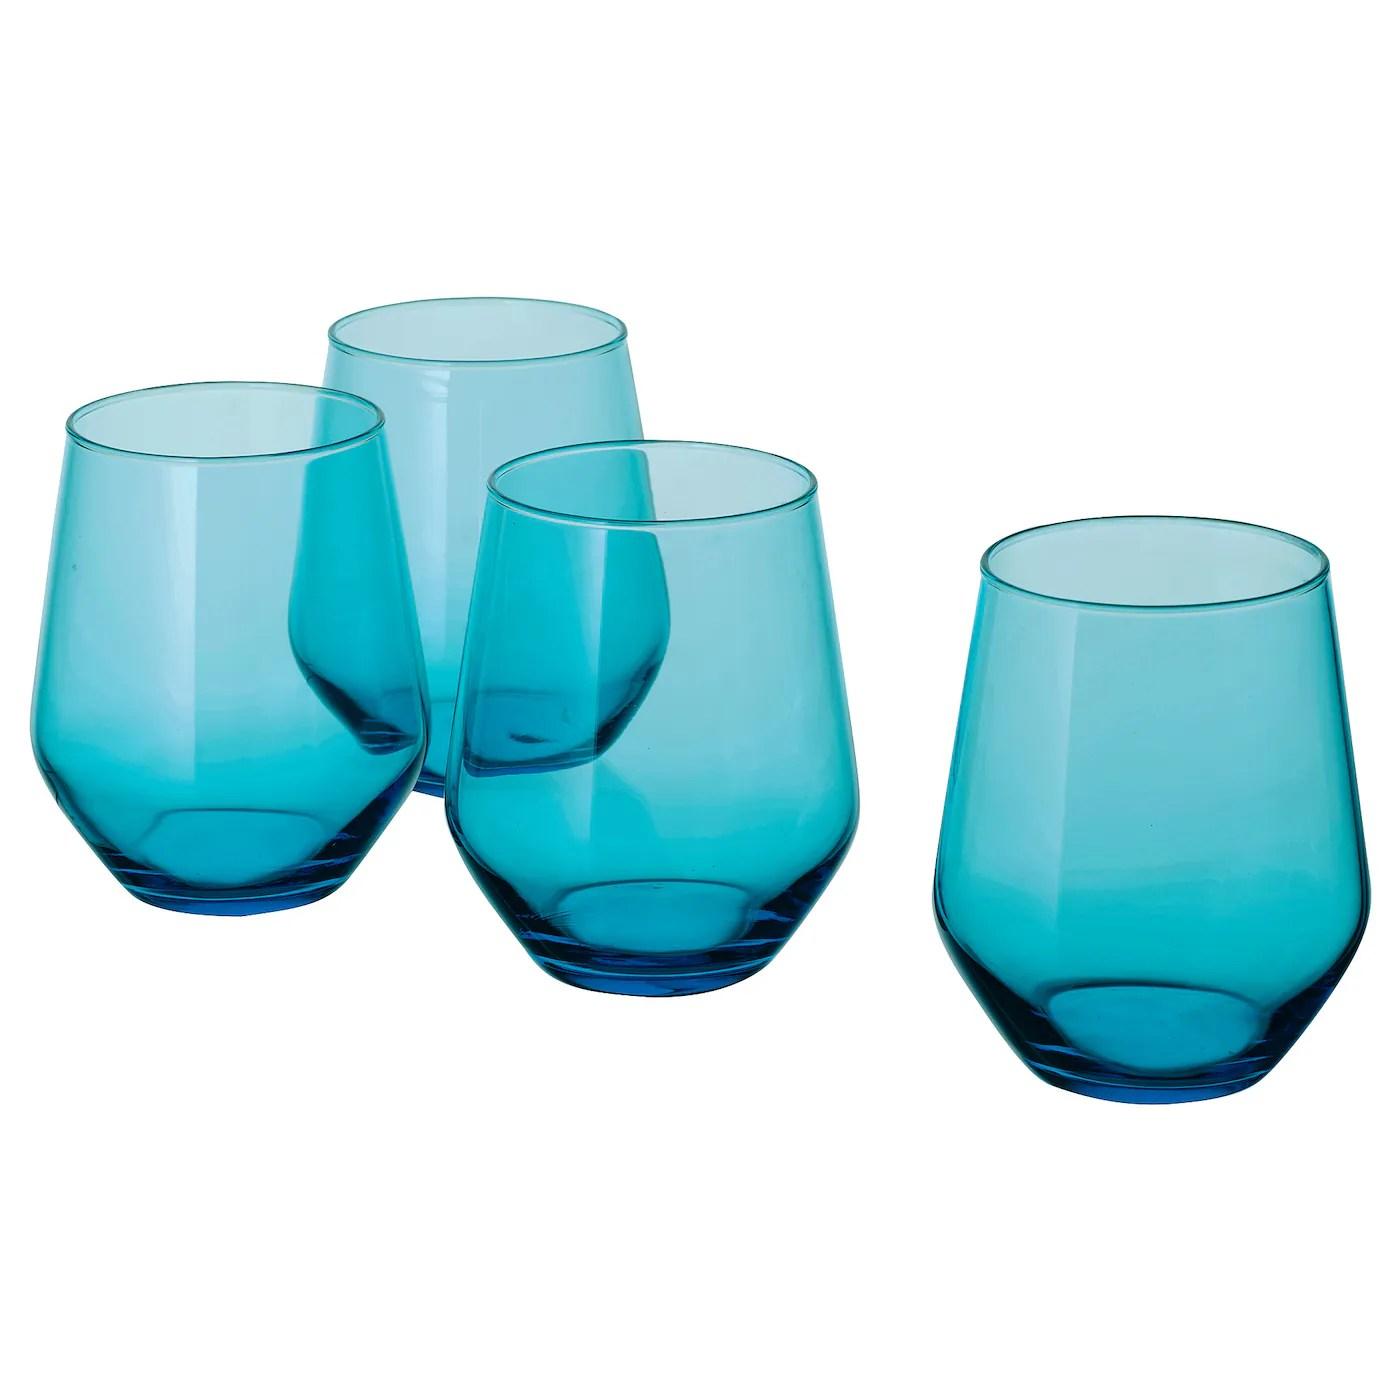 ivrig verre turquoise 45 cl